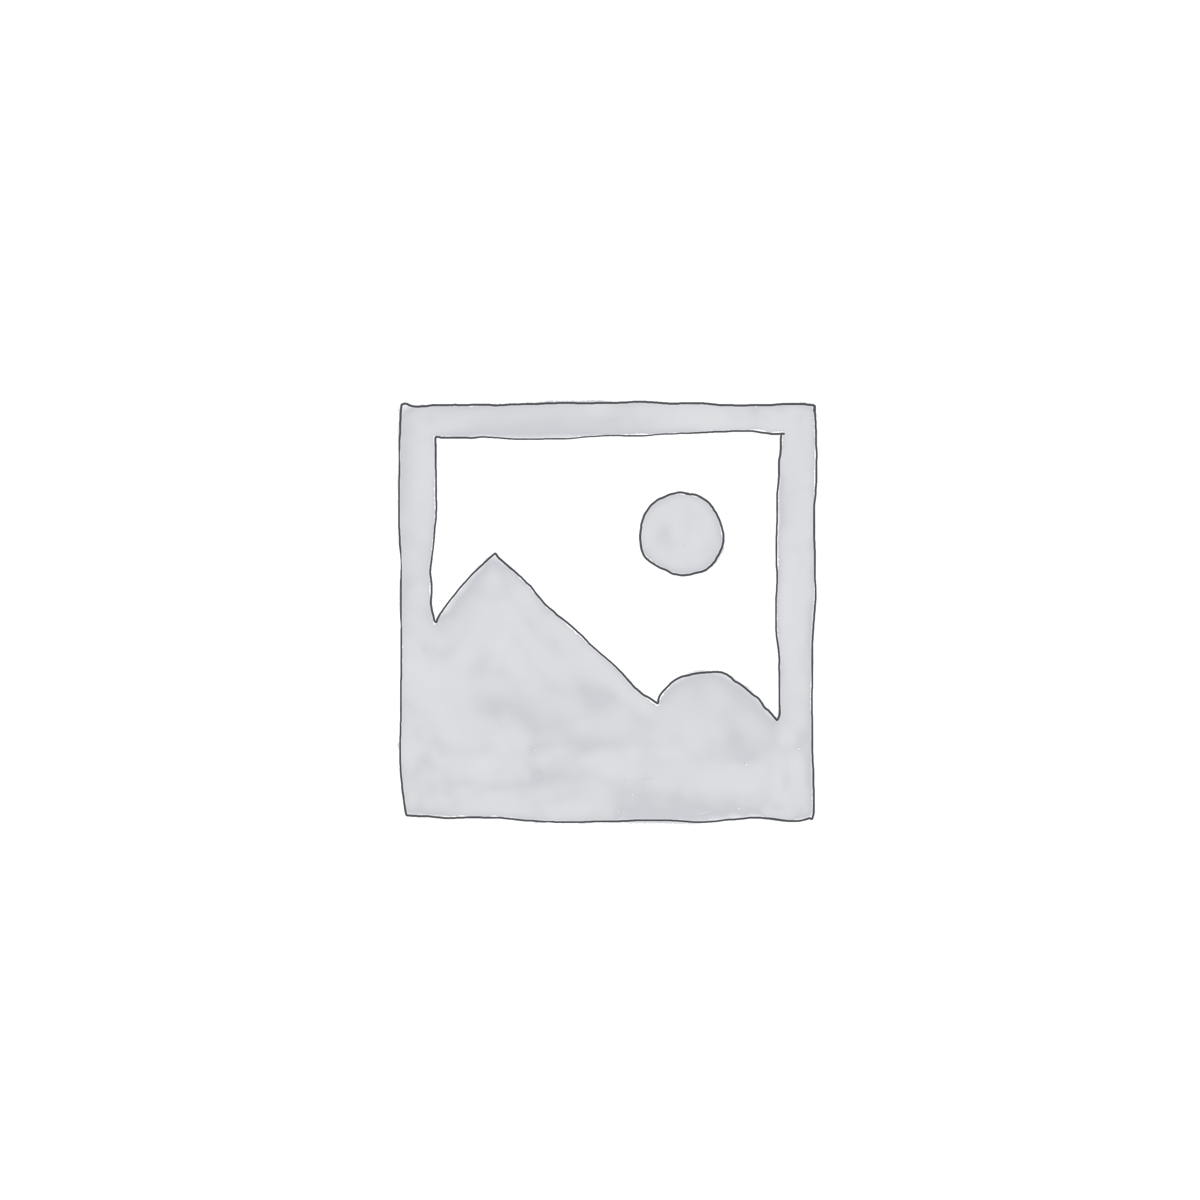 Komatsu 708-1G-00014 MAIN PUMP